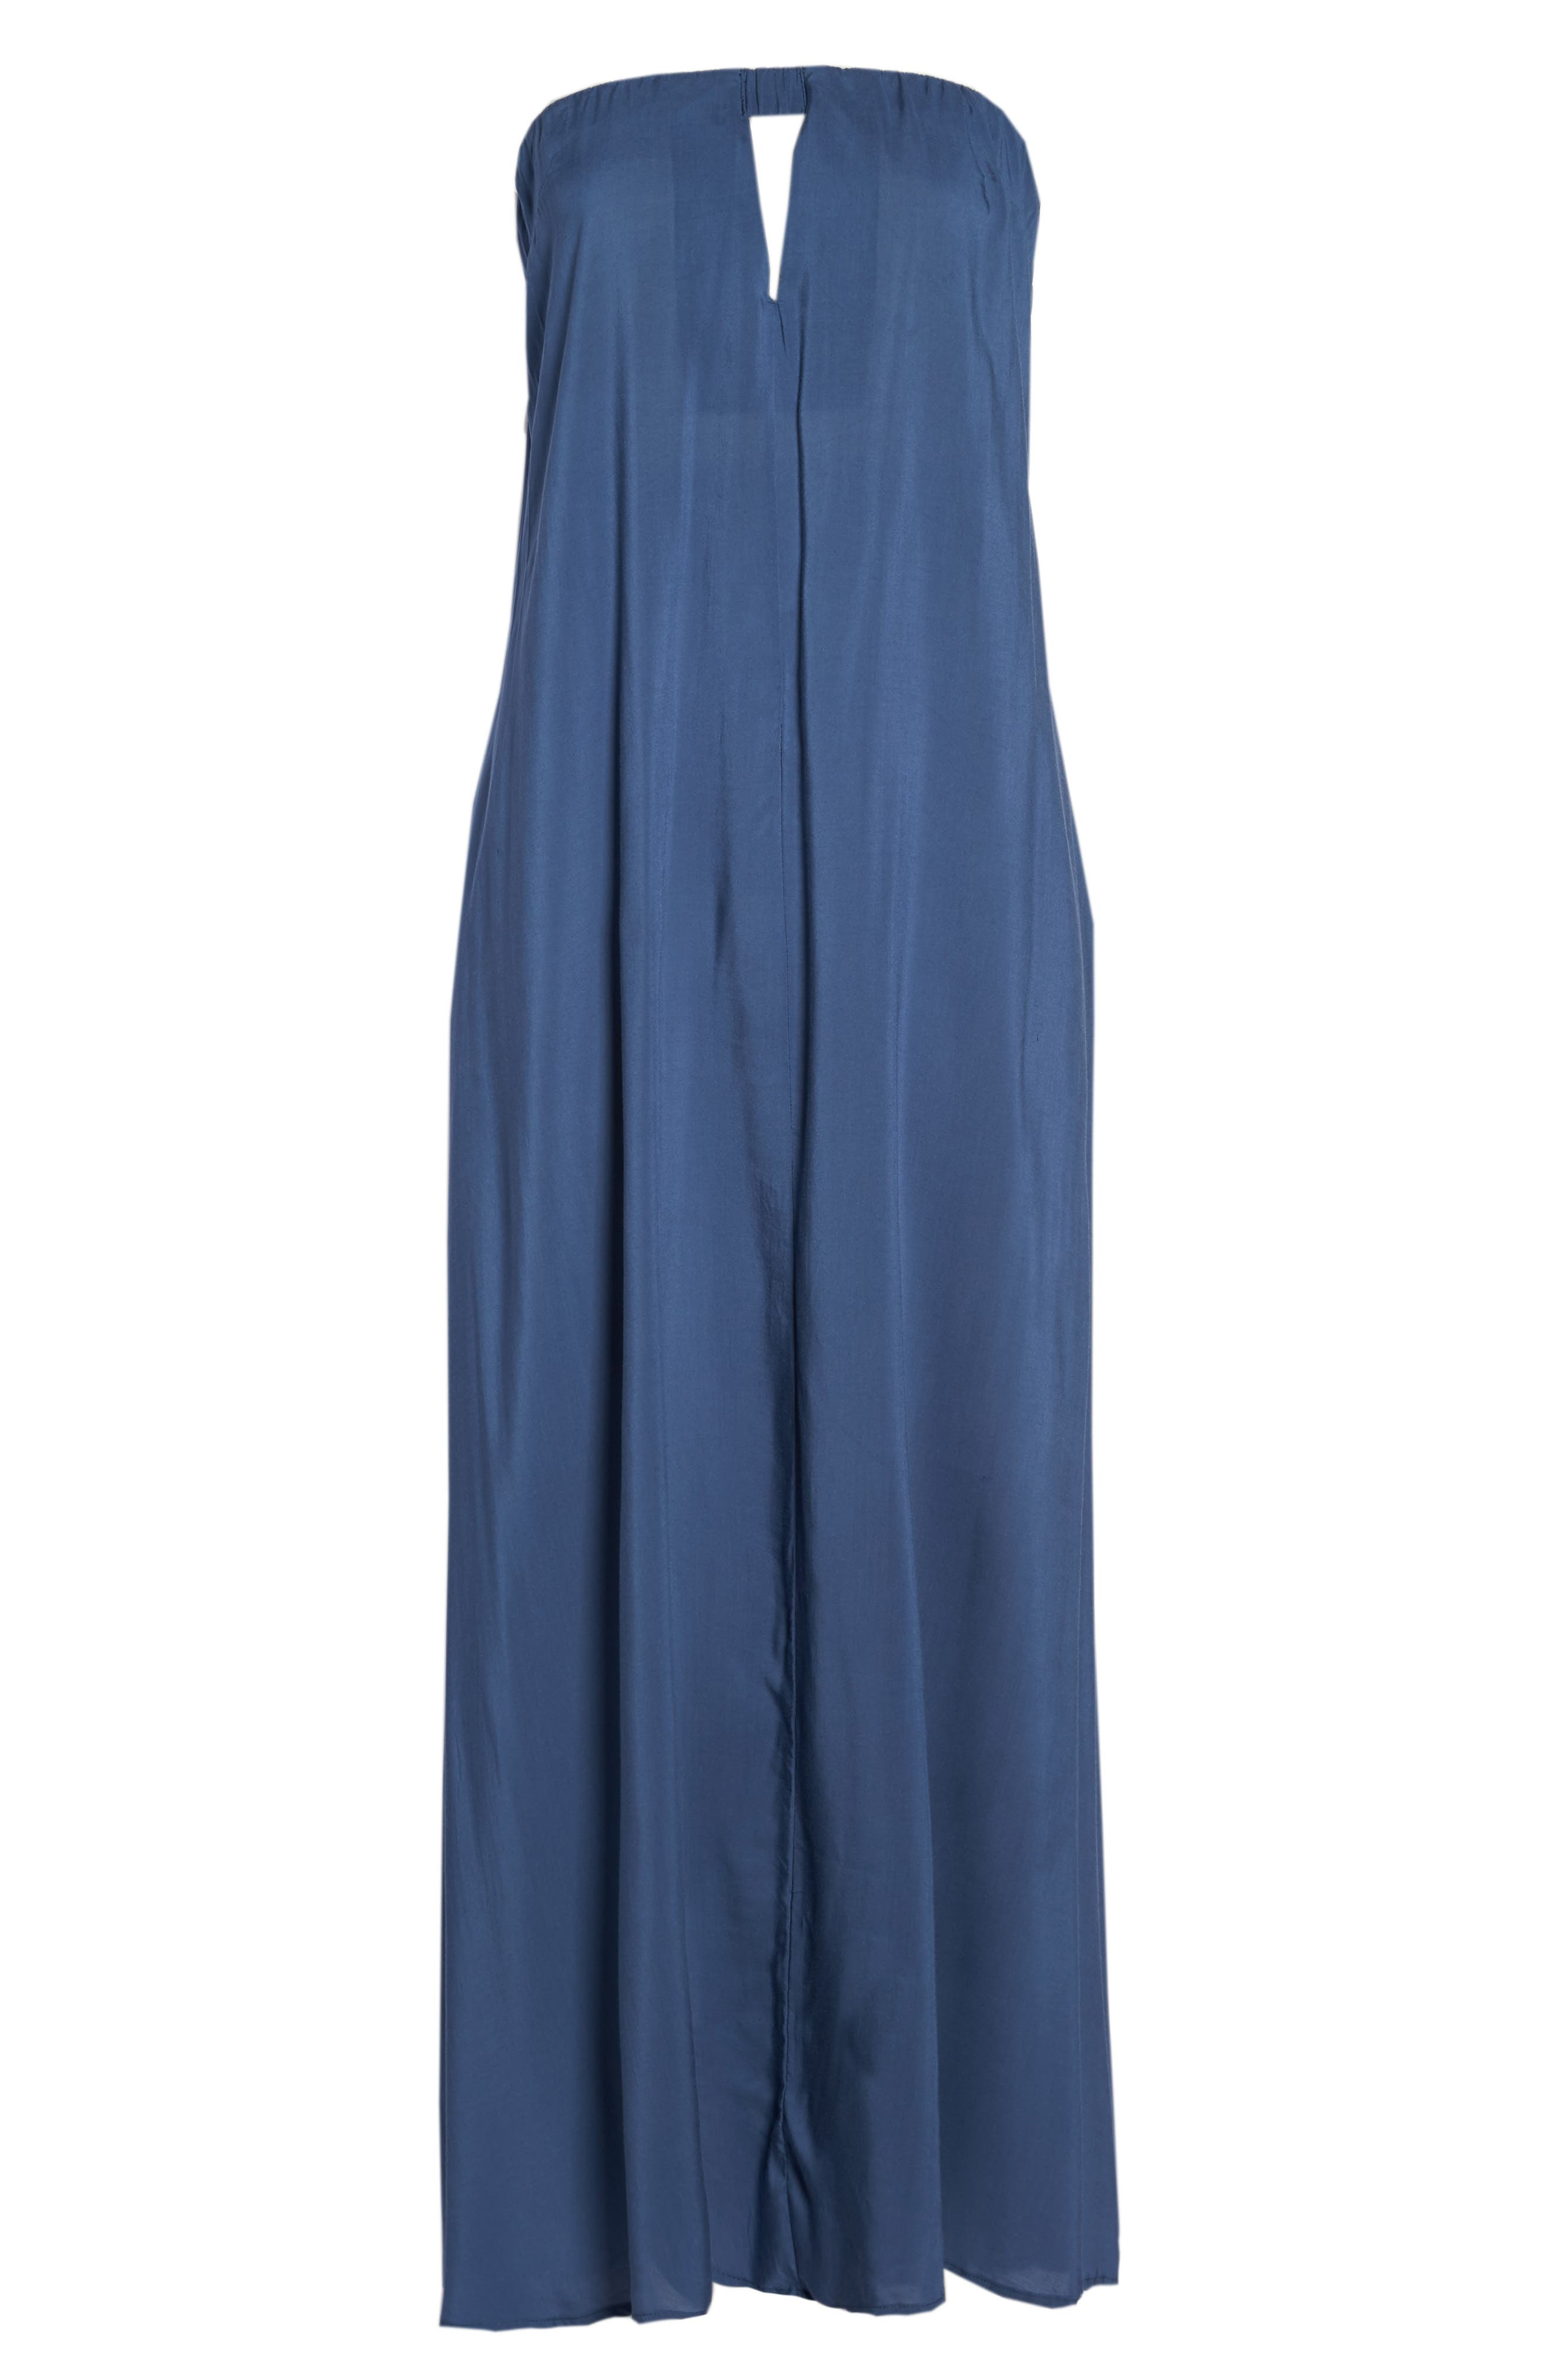 Strapless Keyhole Cover-Up Maxi Dress,                             Alternate thumbnail 6, color,                             Indigo